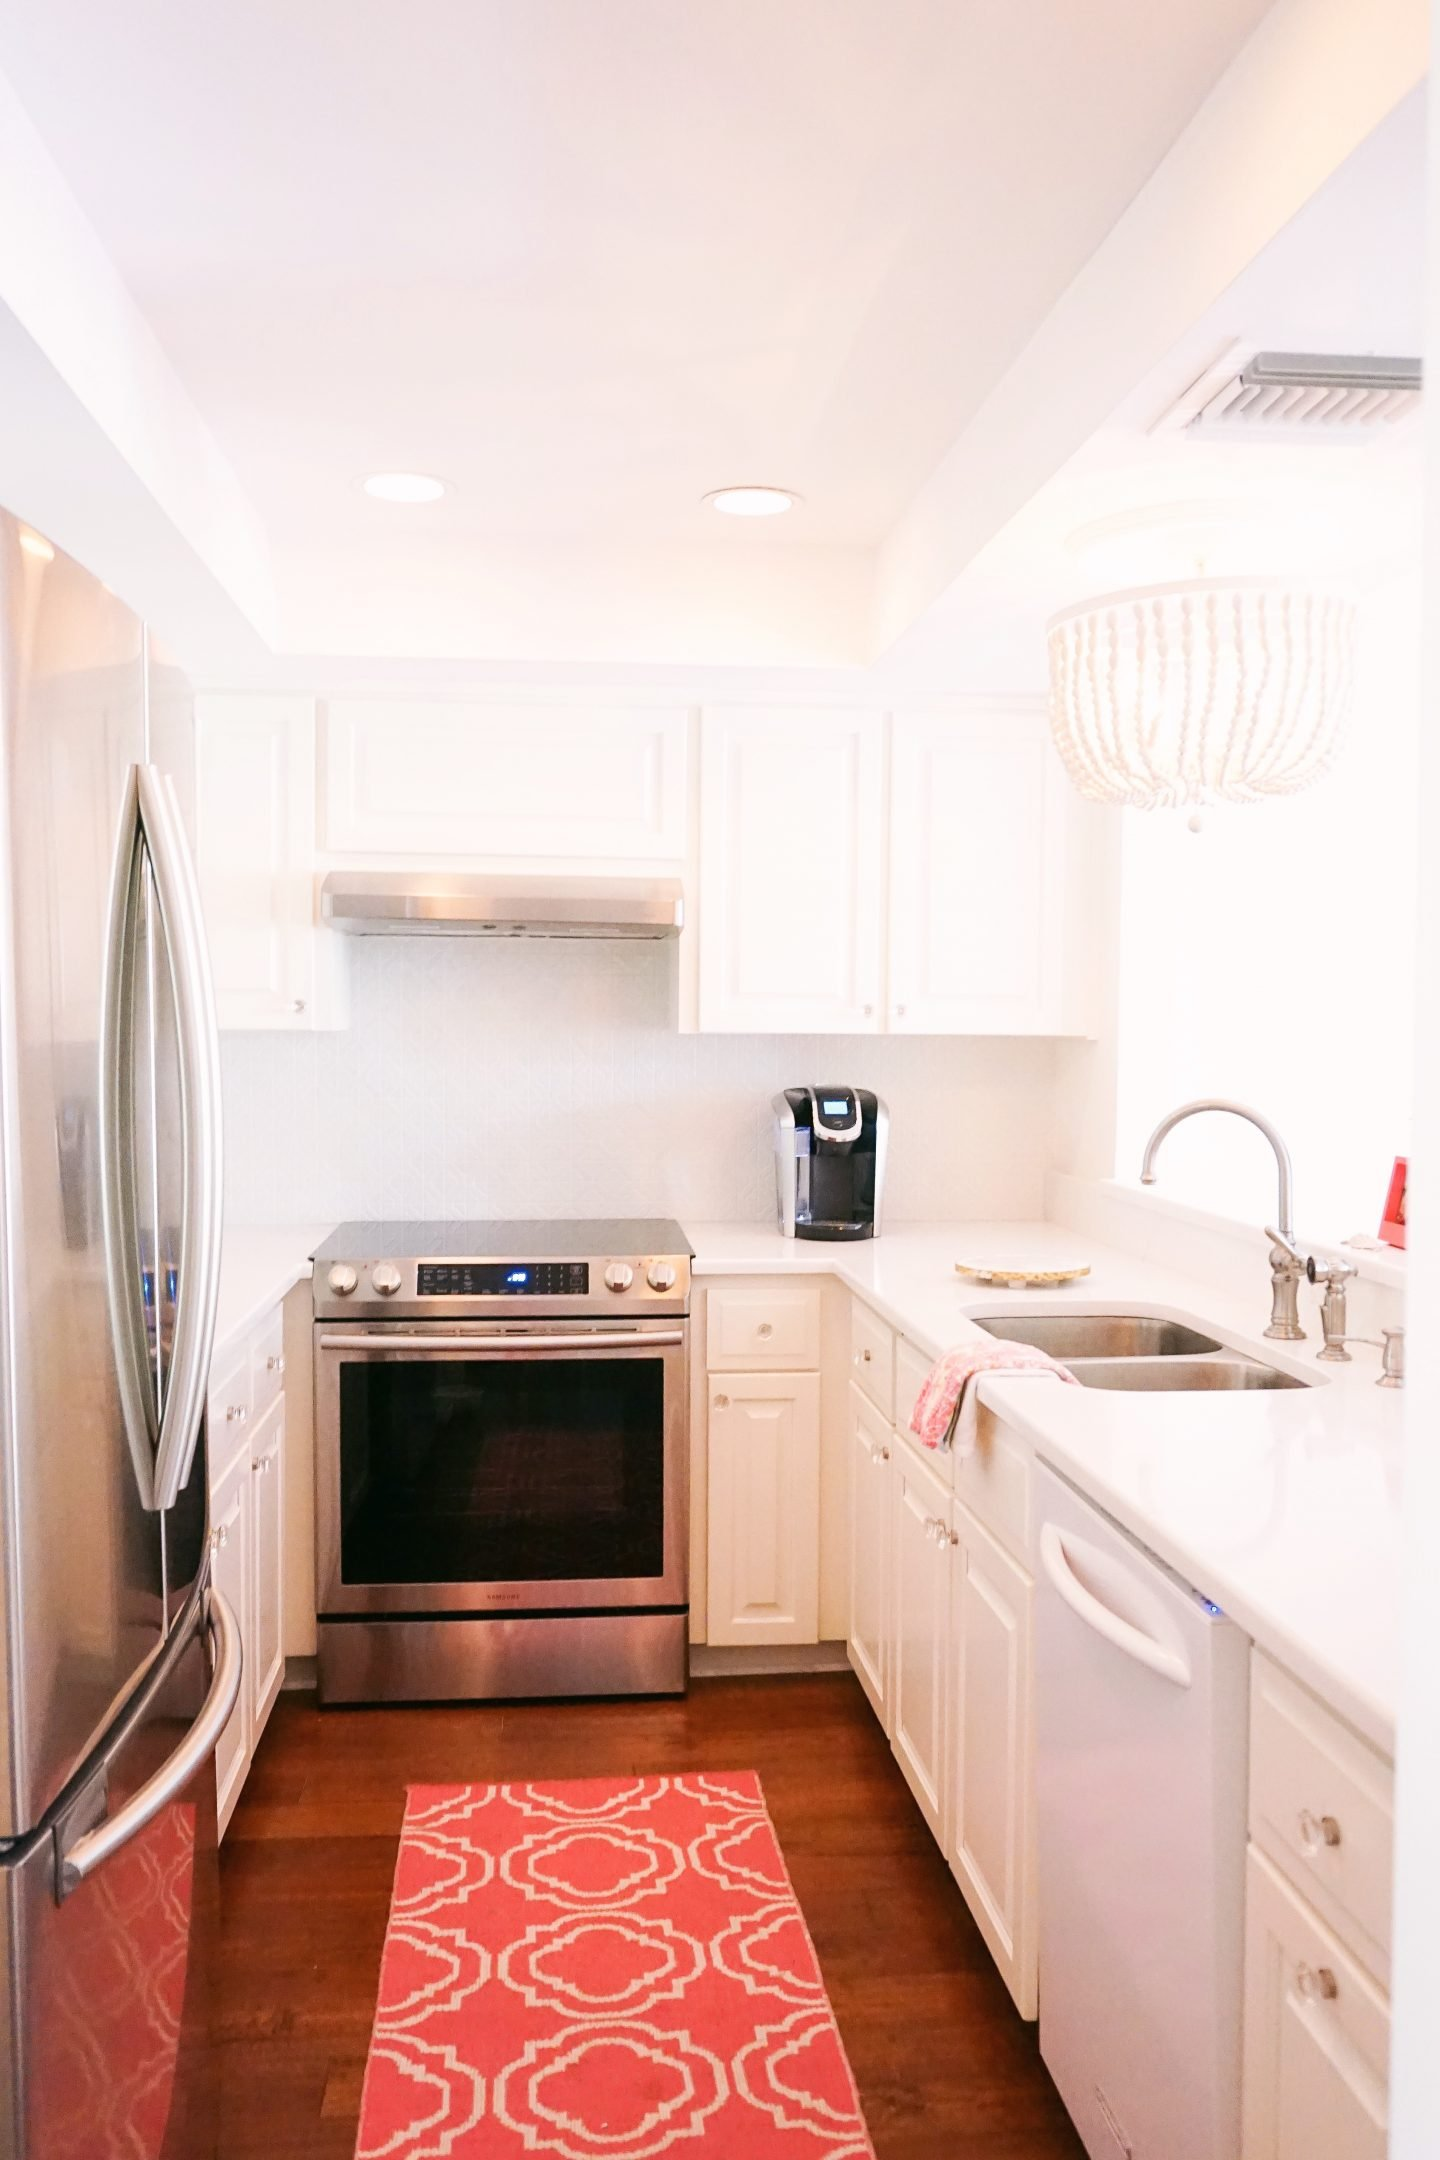 Vero Beach Townhouse kitchen